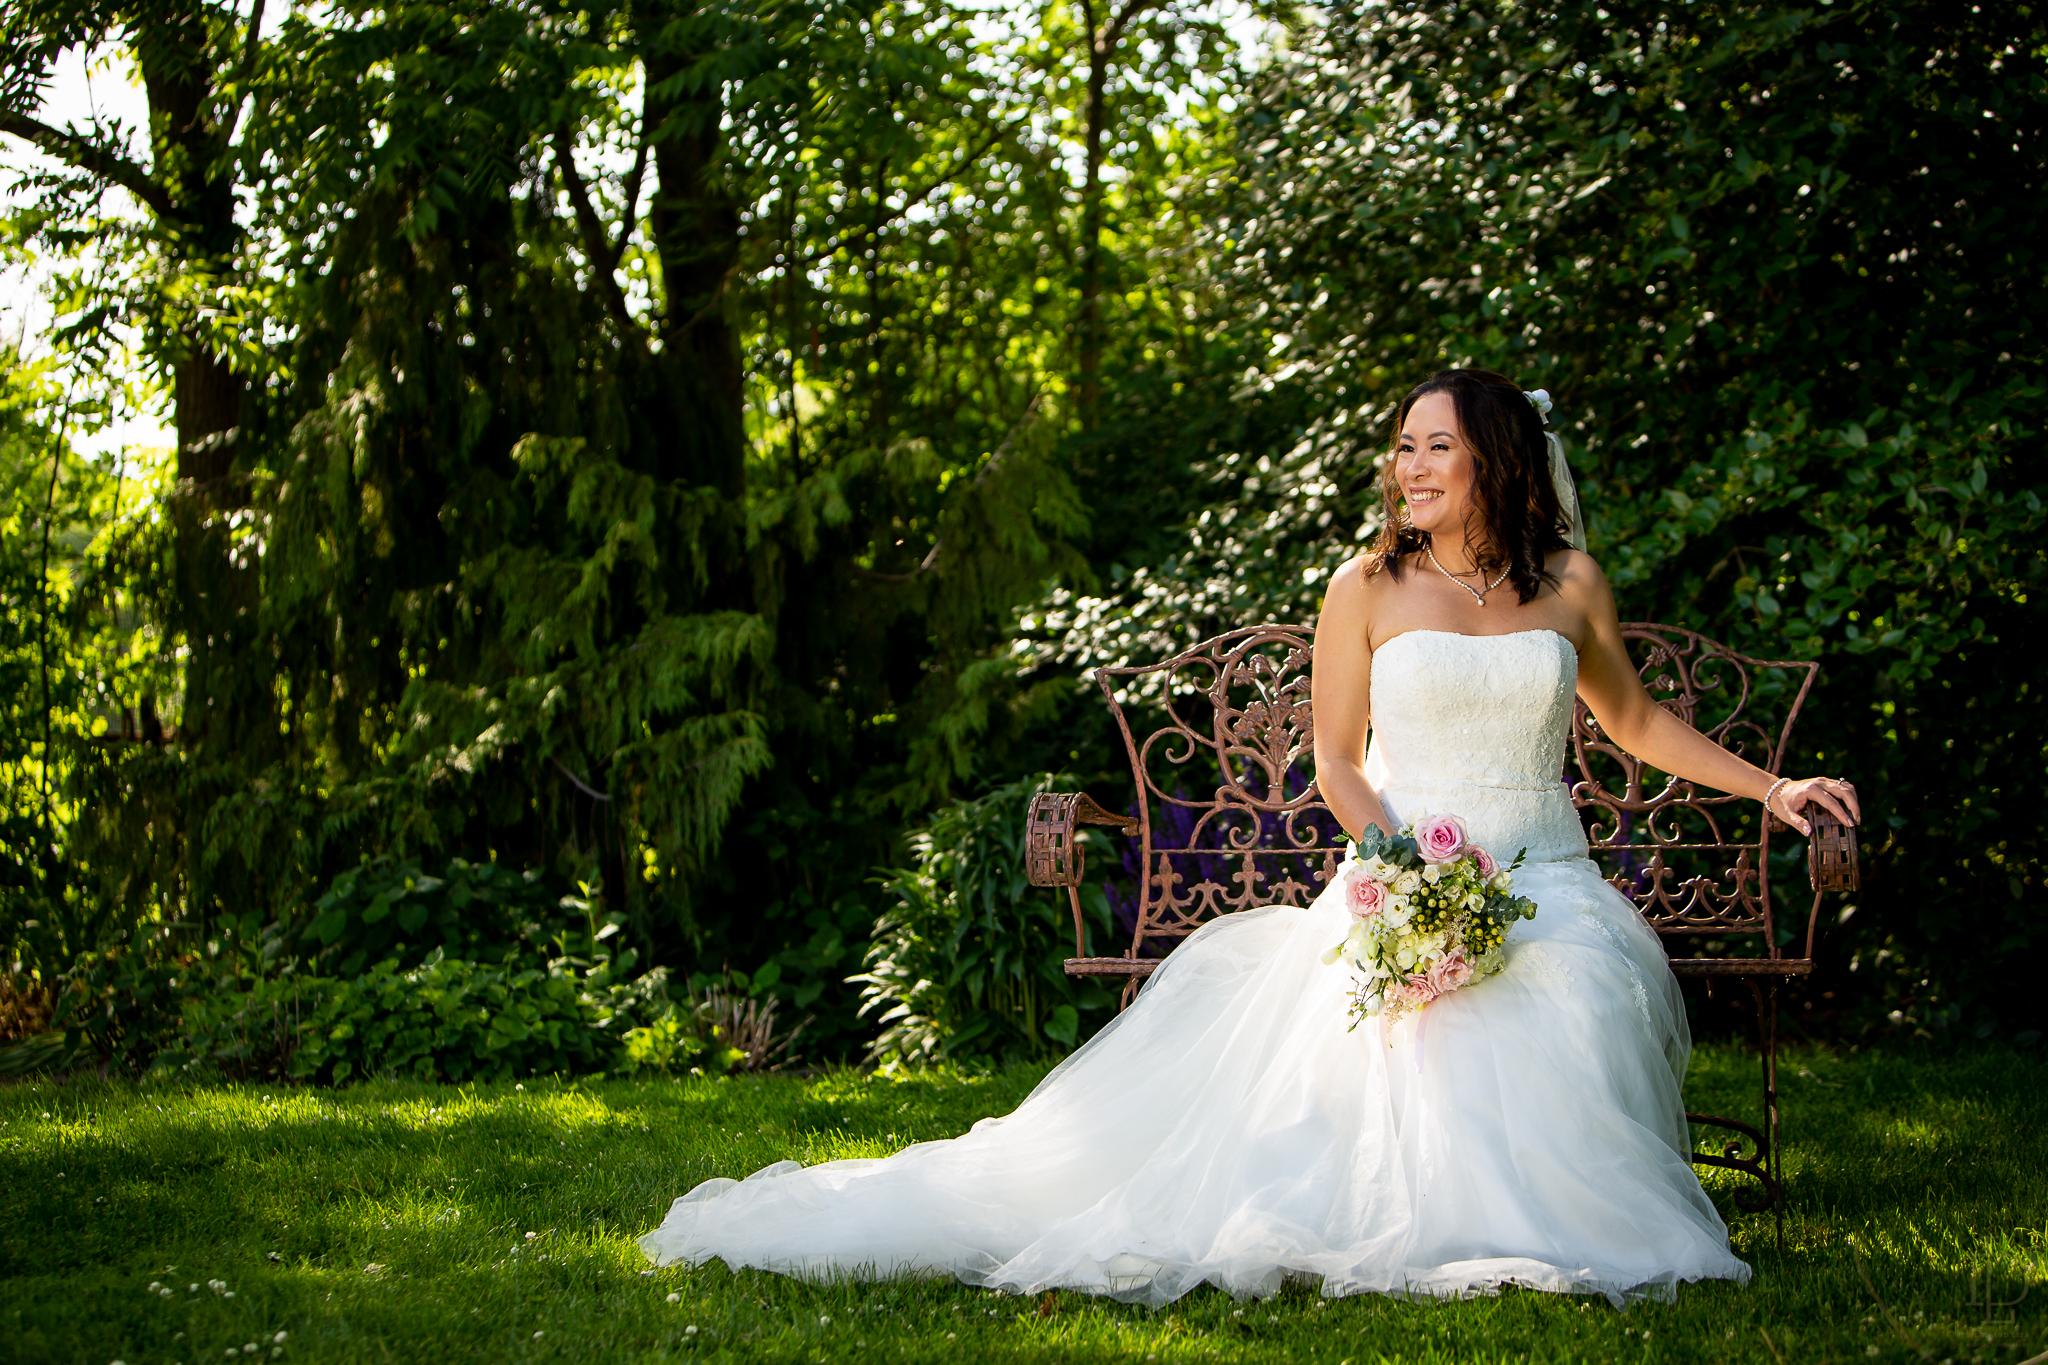 Toronto-wedding-Photograper-28.jpg